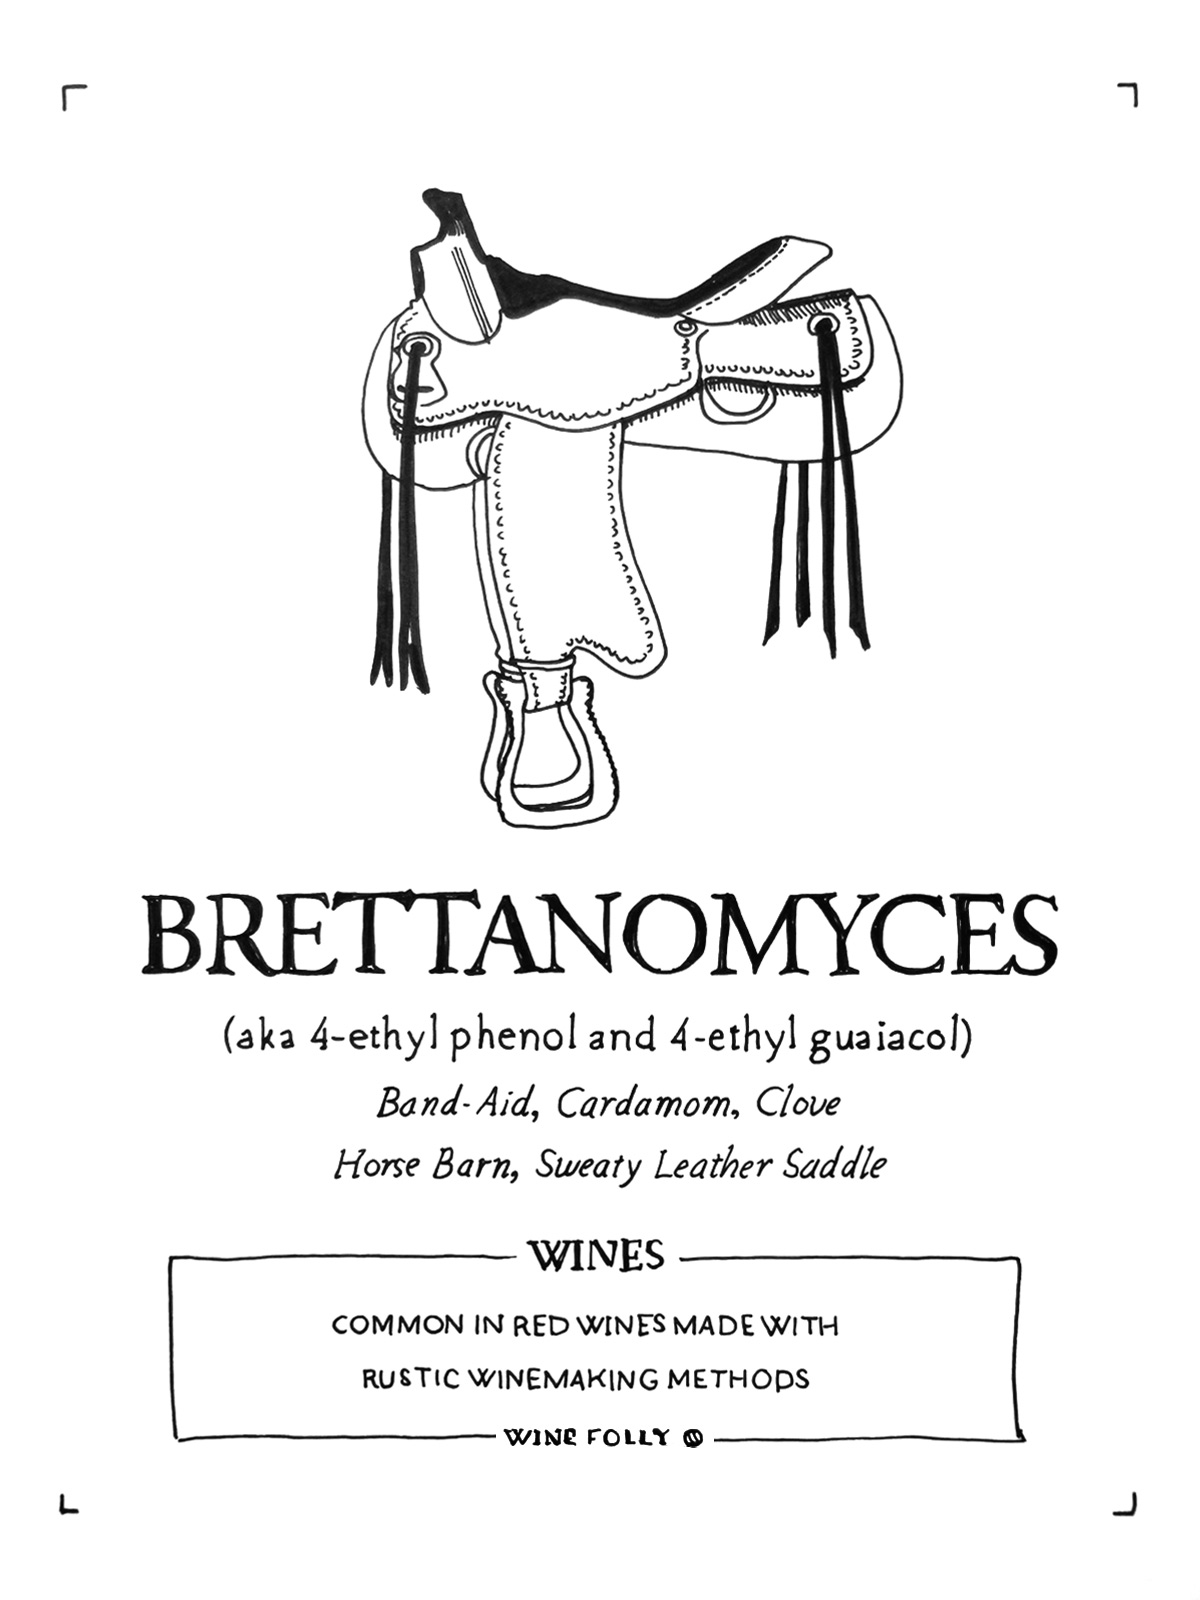 brettanomyces-wine-folly-illustration